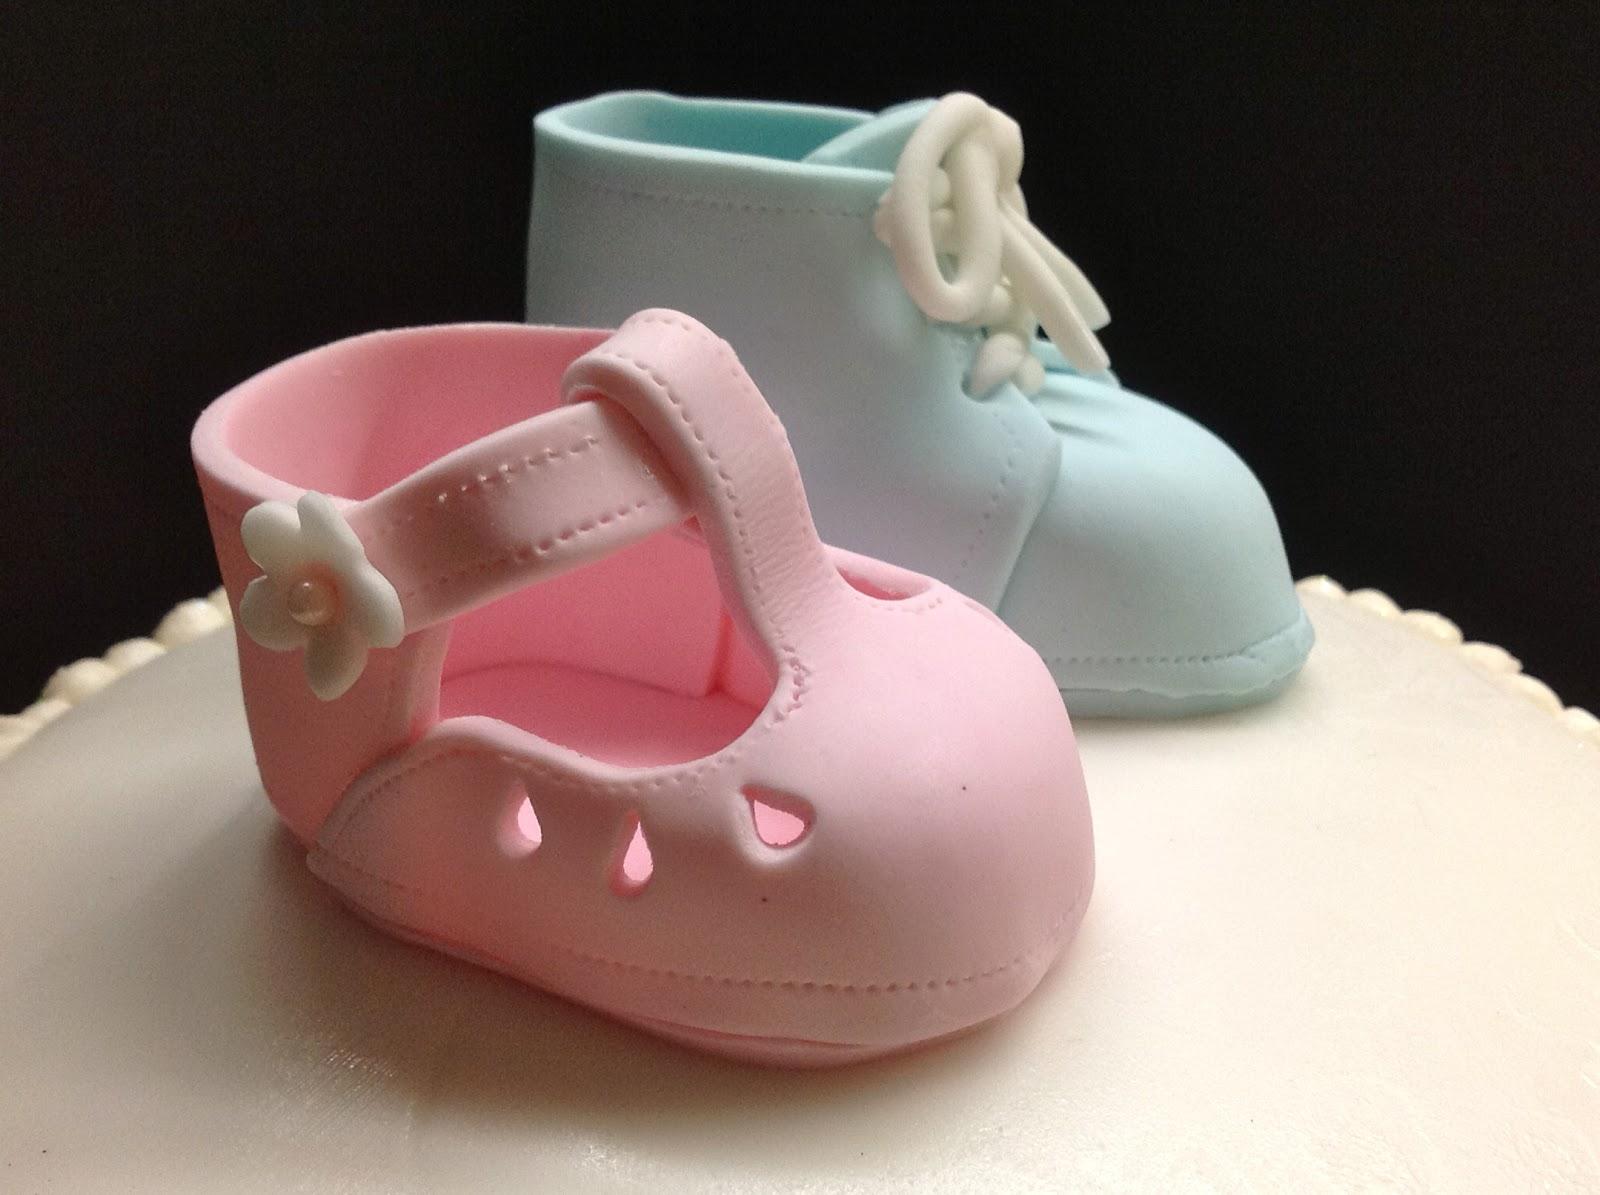 Plumeria Cake Studio: Baby Bootie Gender Reveal Cake